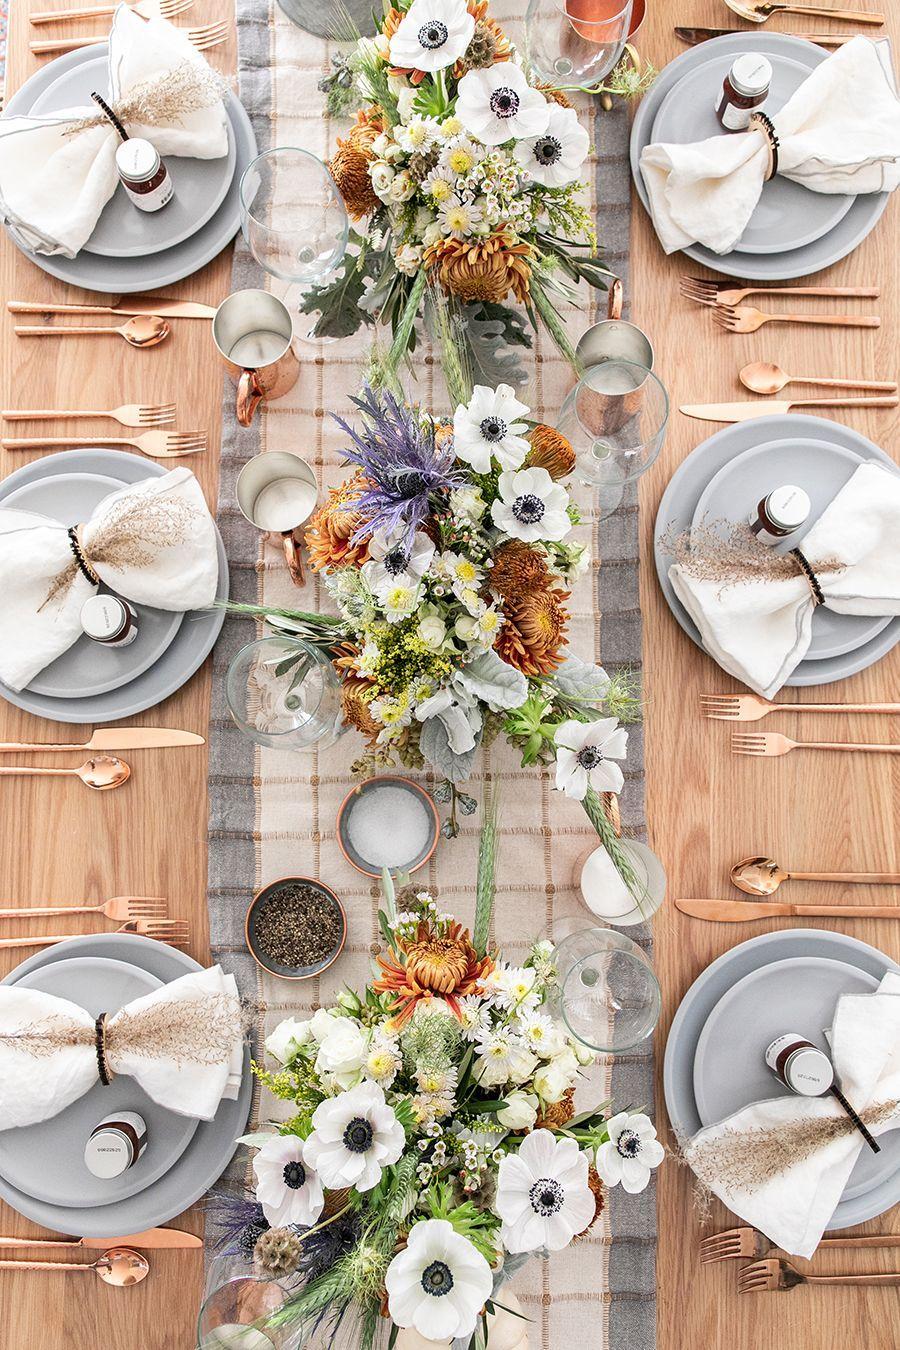 40 Best Thanksgiving Table Decor Ideas - Thanksgiving Table Settings